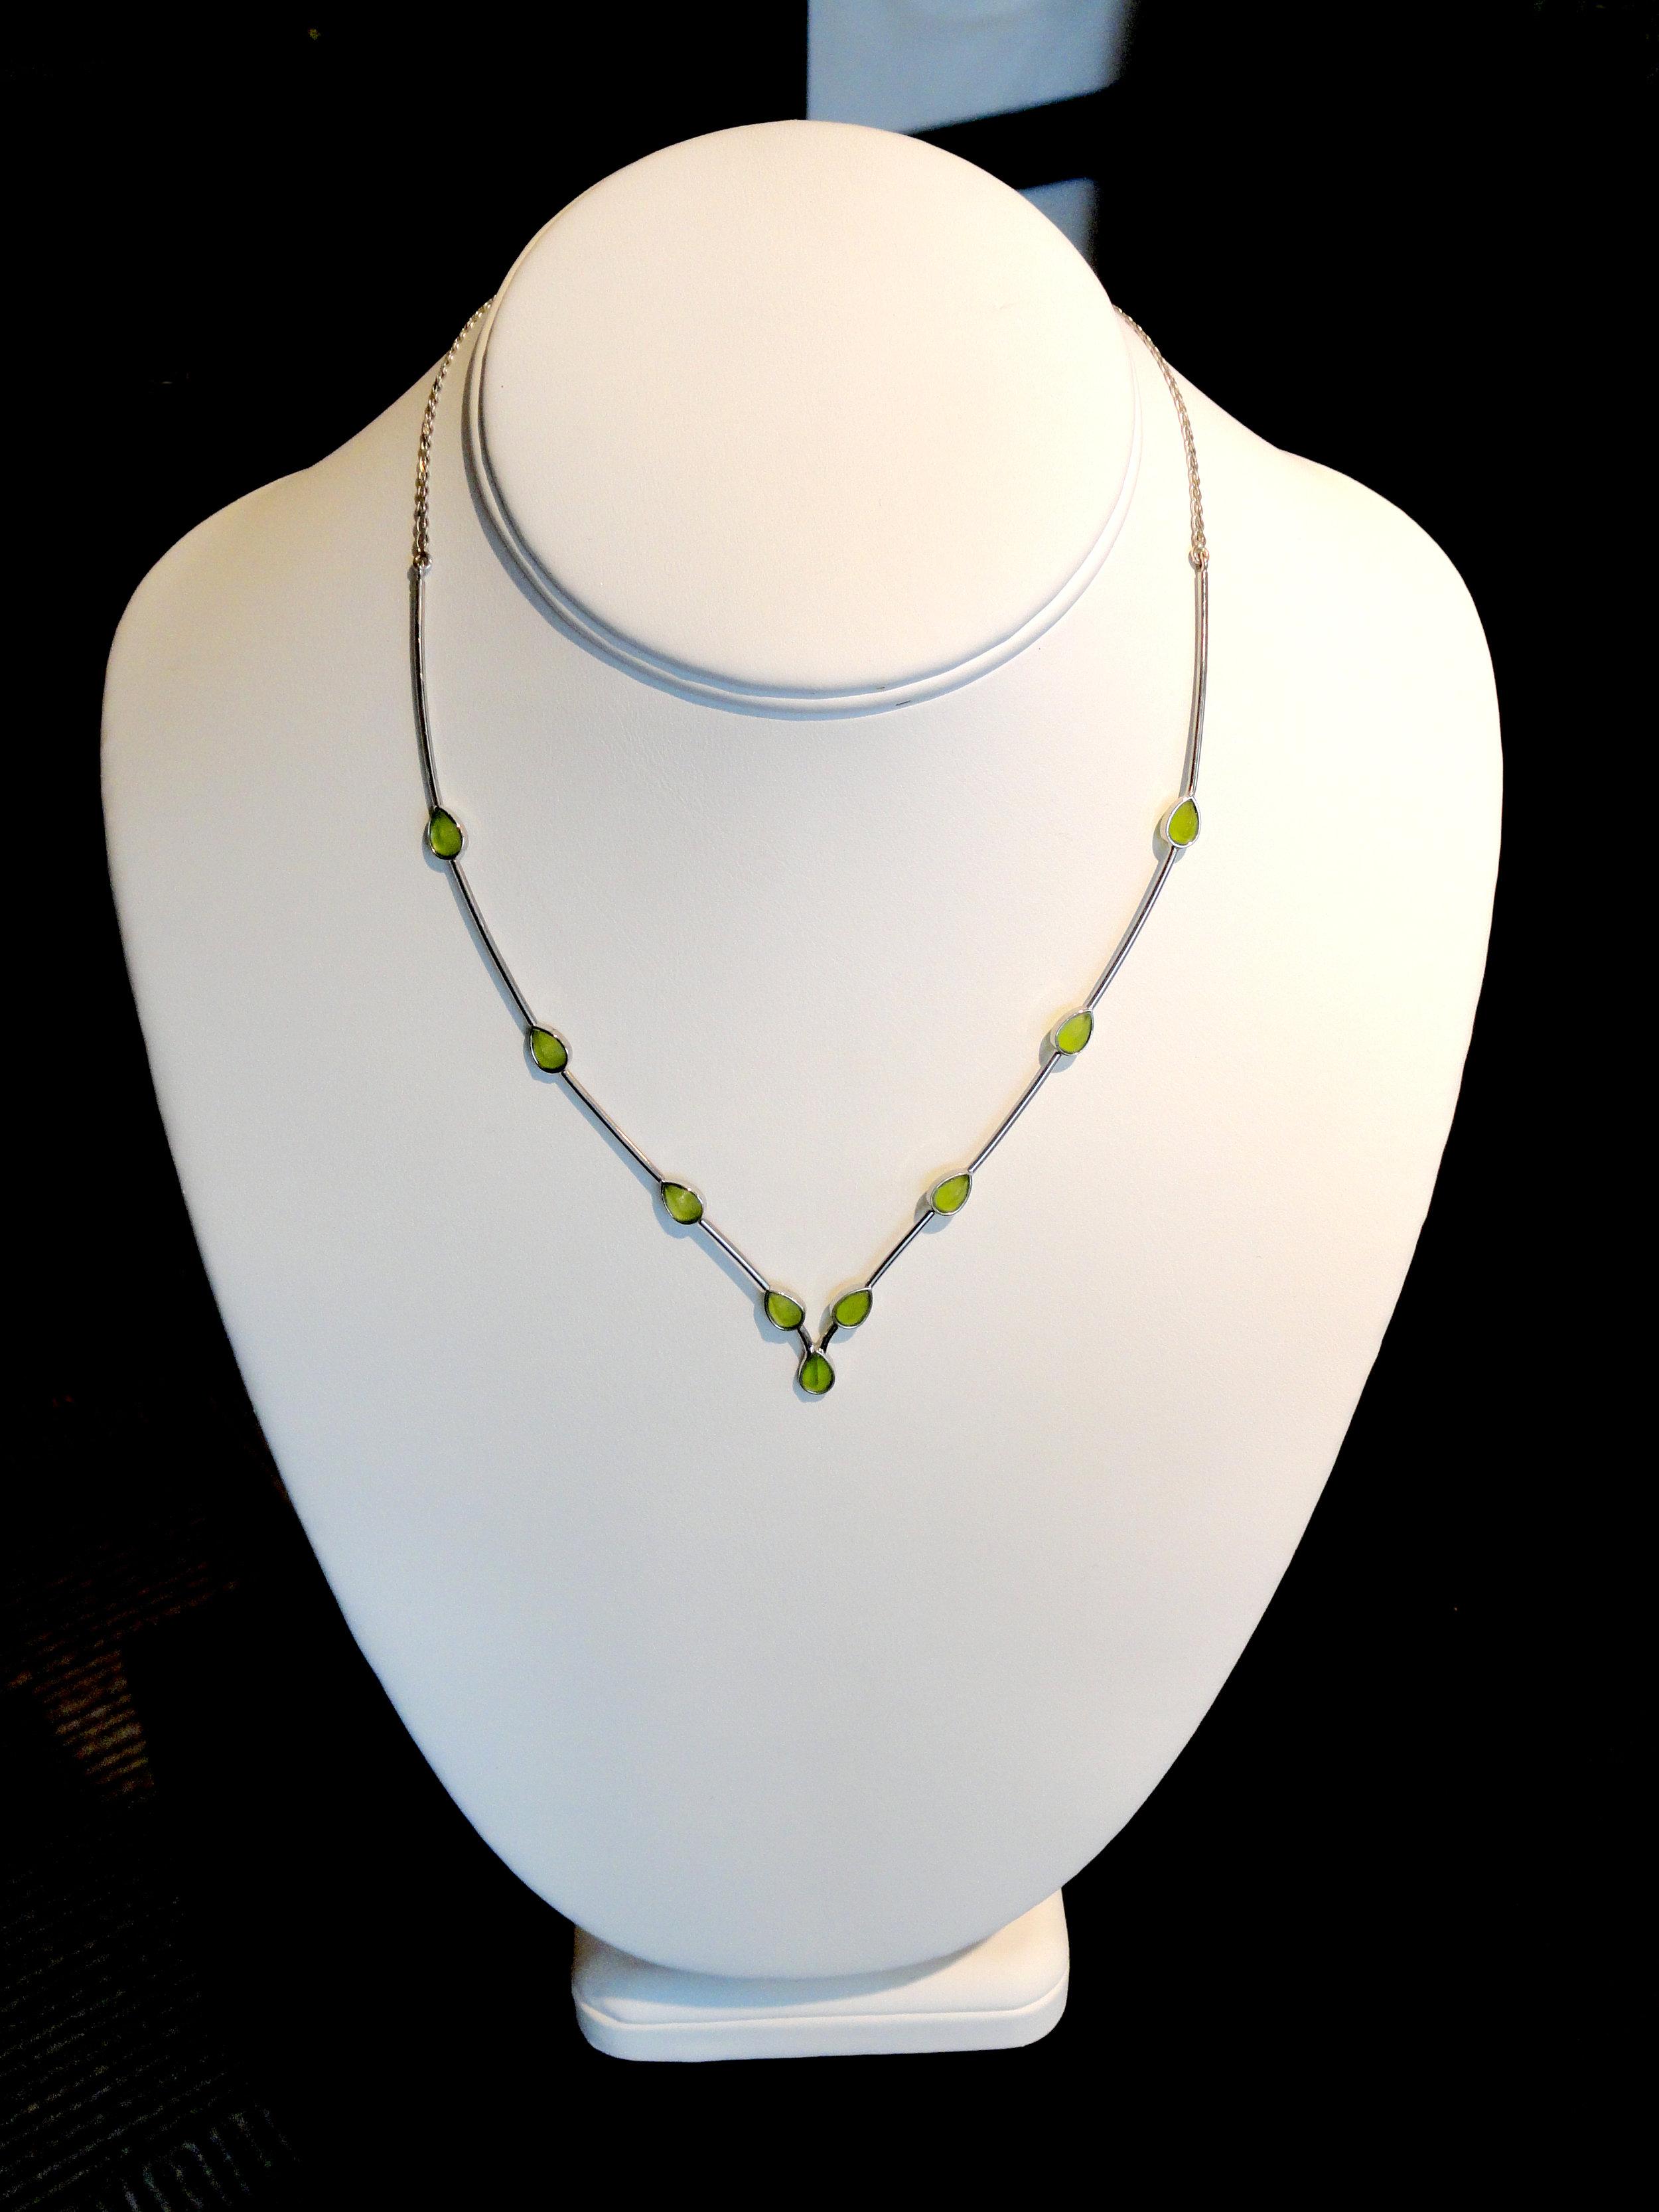 darvier-satin-peridot-dew-drop-necklace.JPG